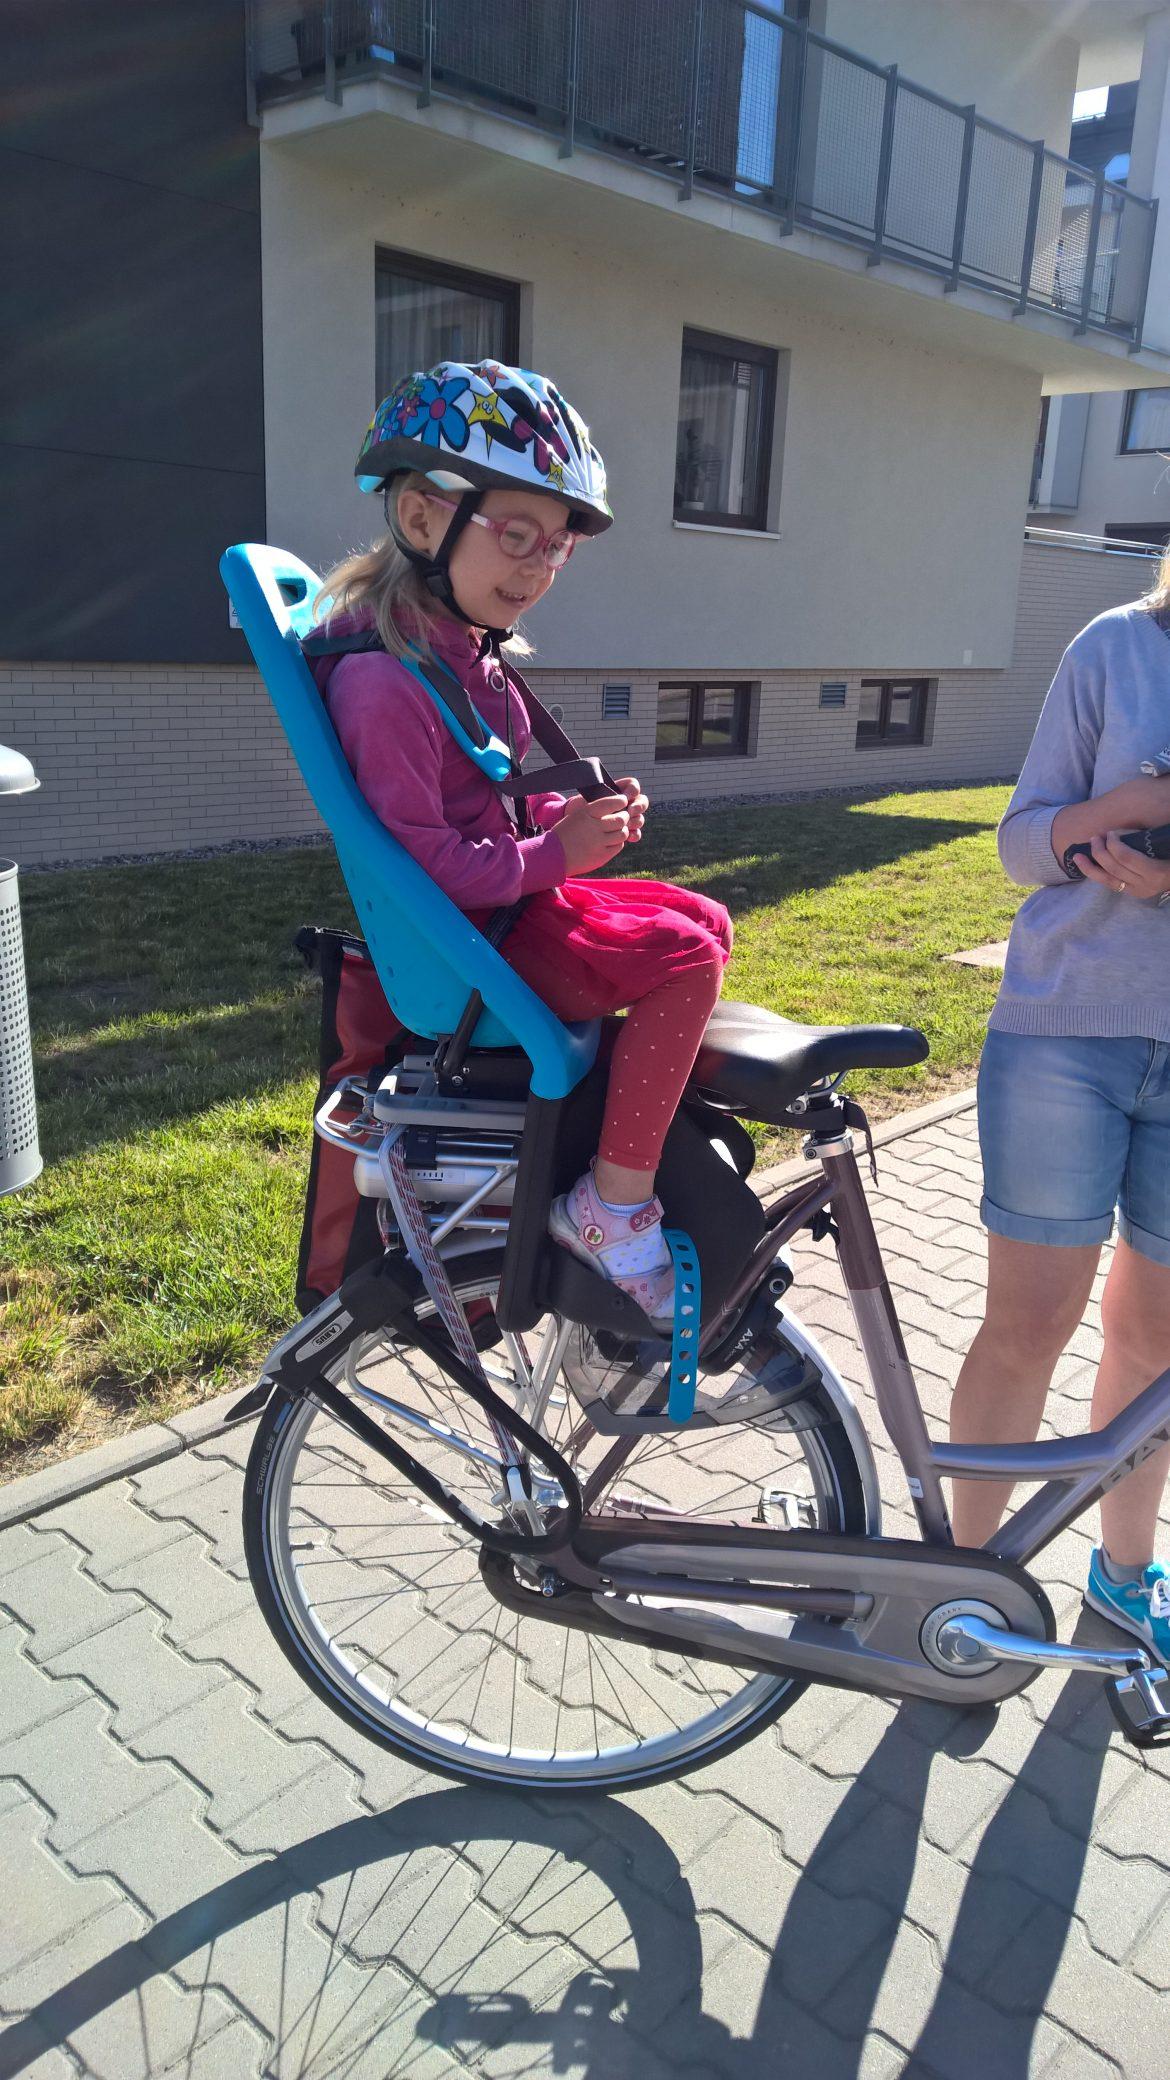 3328b9ca786958 Fotelik rowerowy Yepp Maxi EasyFit - test fotelika rowerowego montowanego  na bagażniku (4)